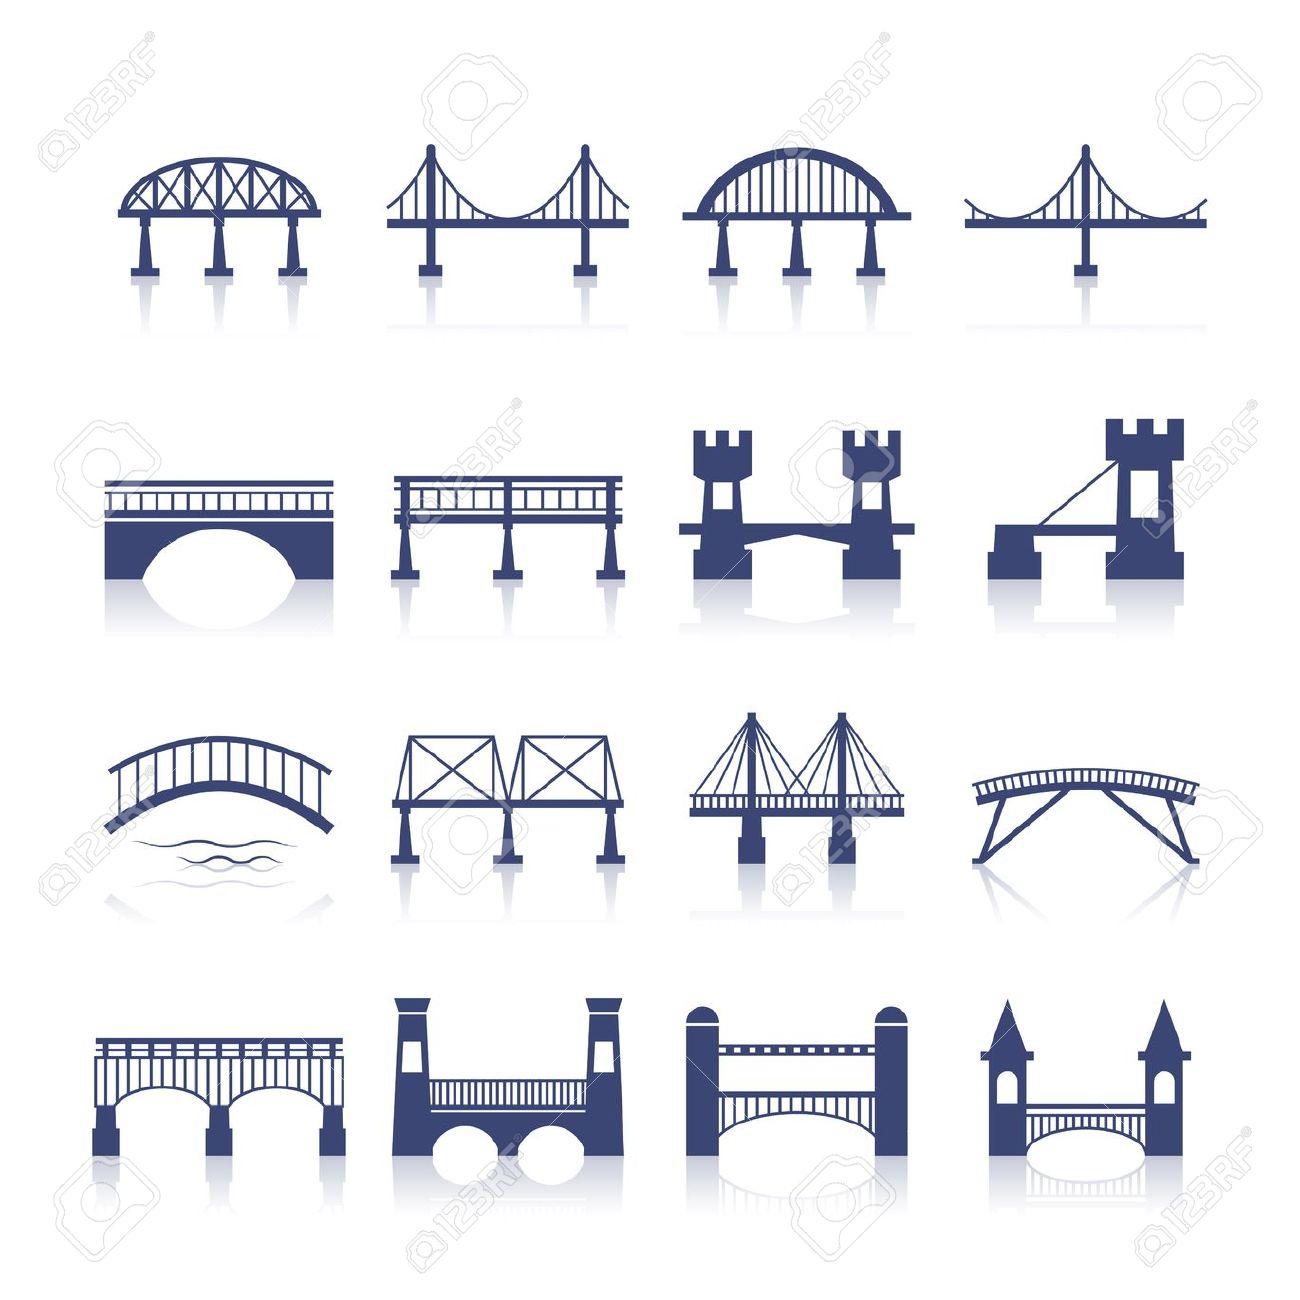 Bridge Architecture City Landmark Silhouette Icon Set Isolated.